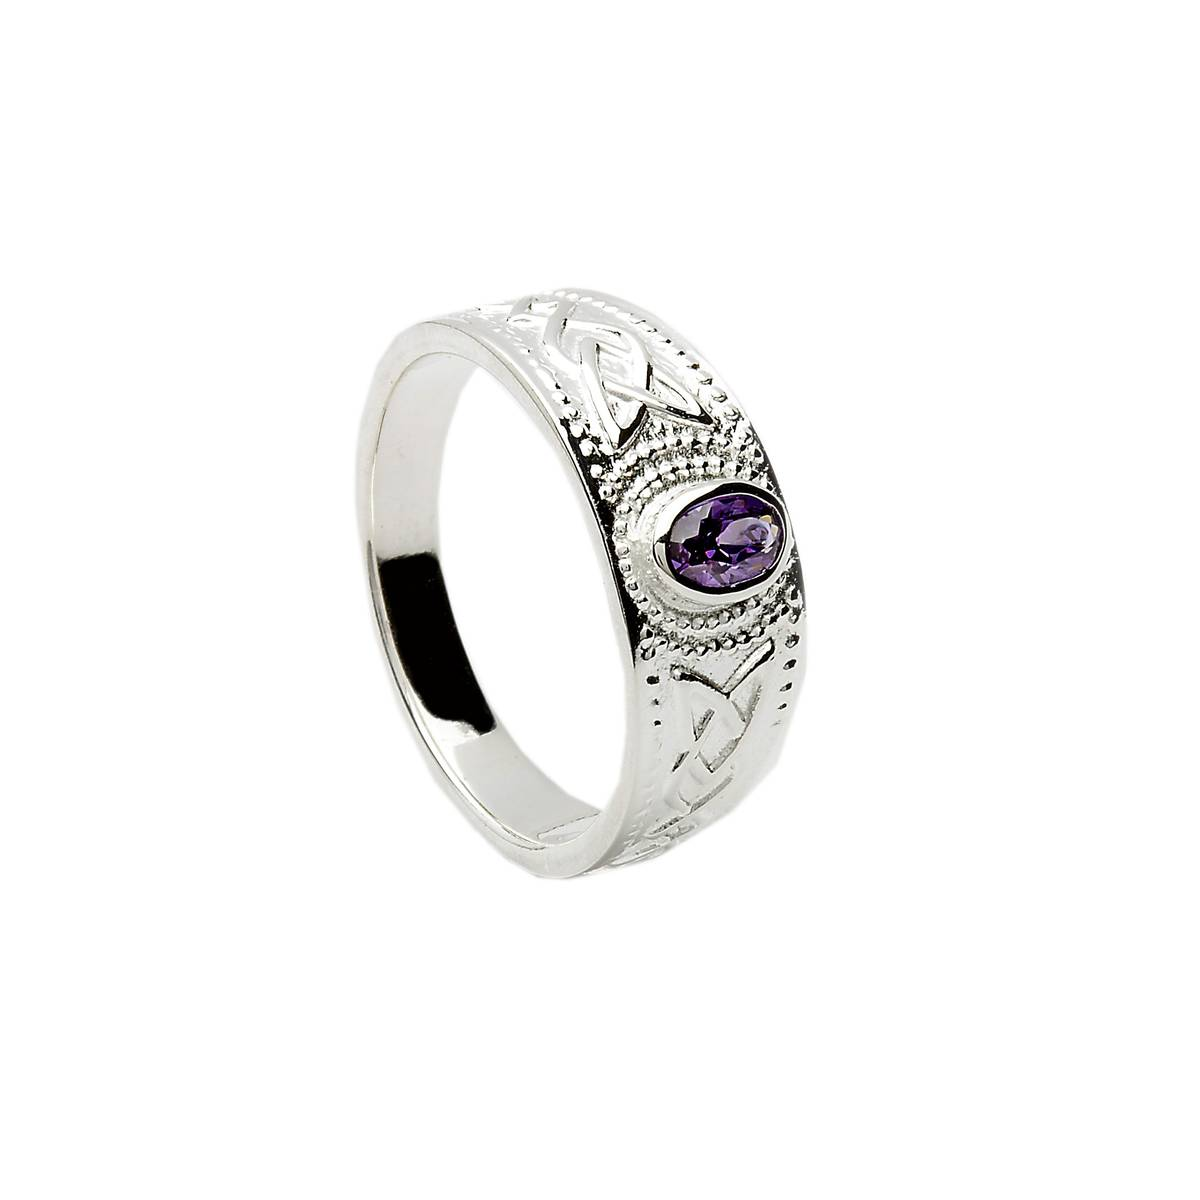 Silver man's olivine set contemporary celtic design ring